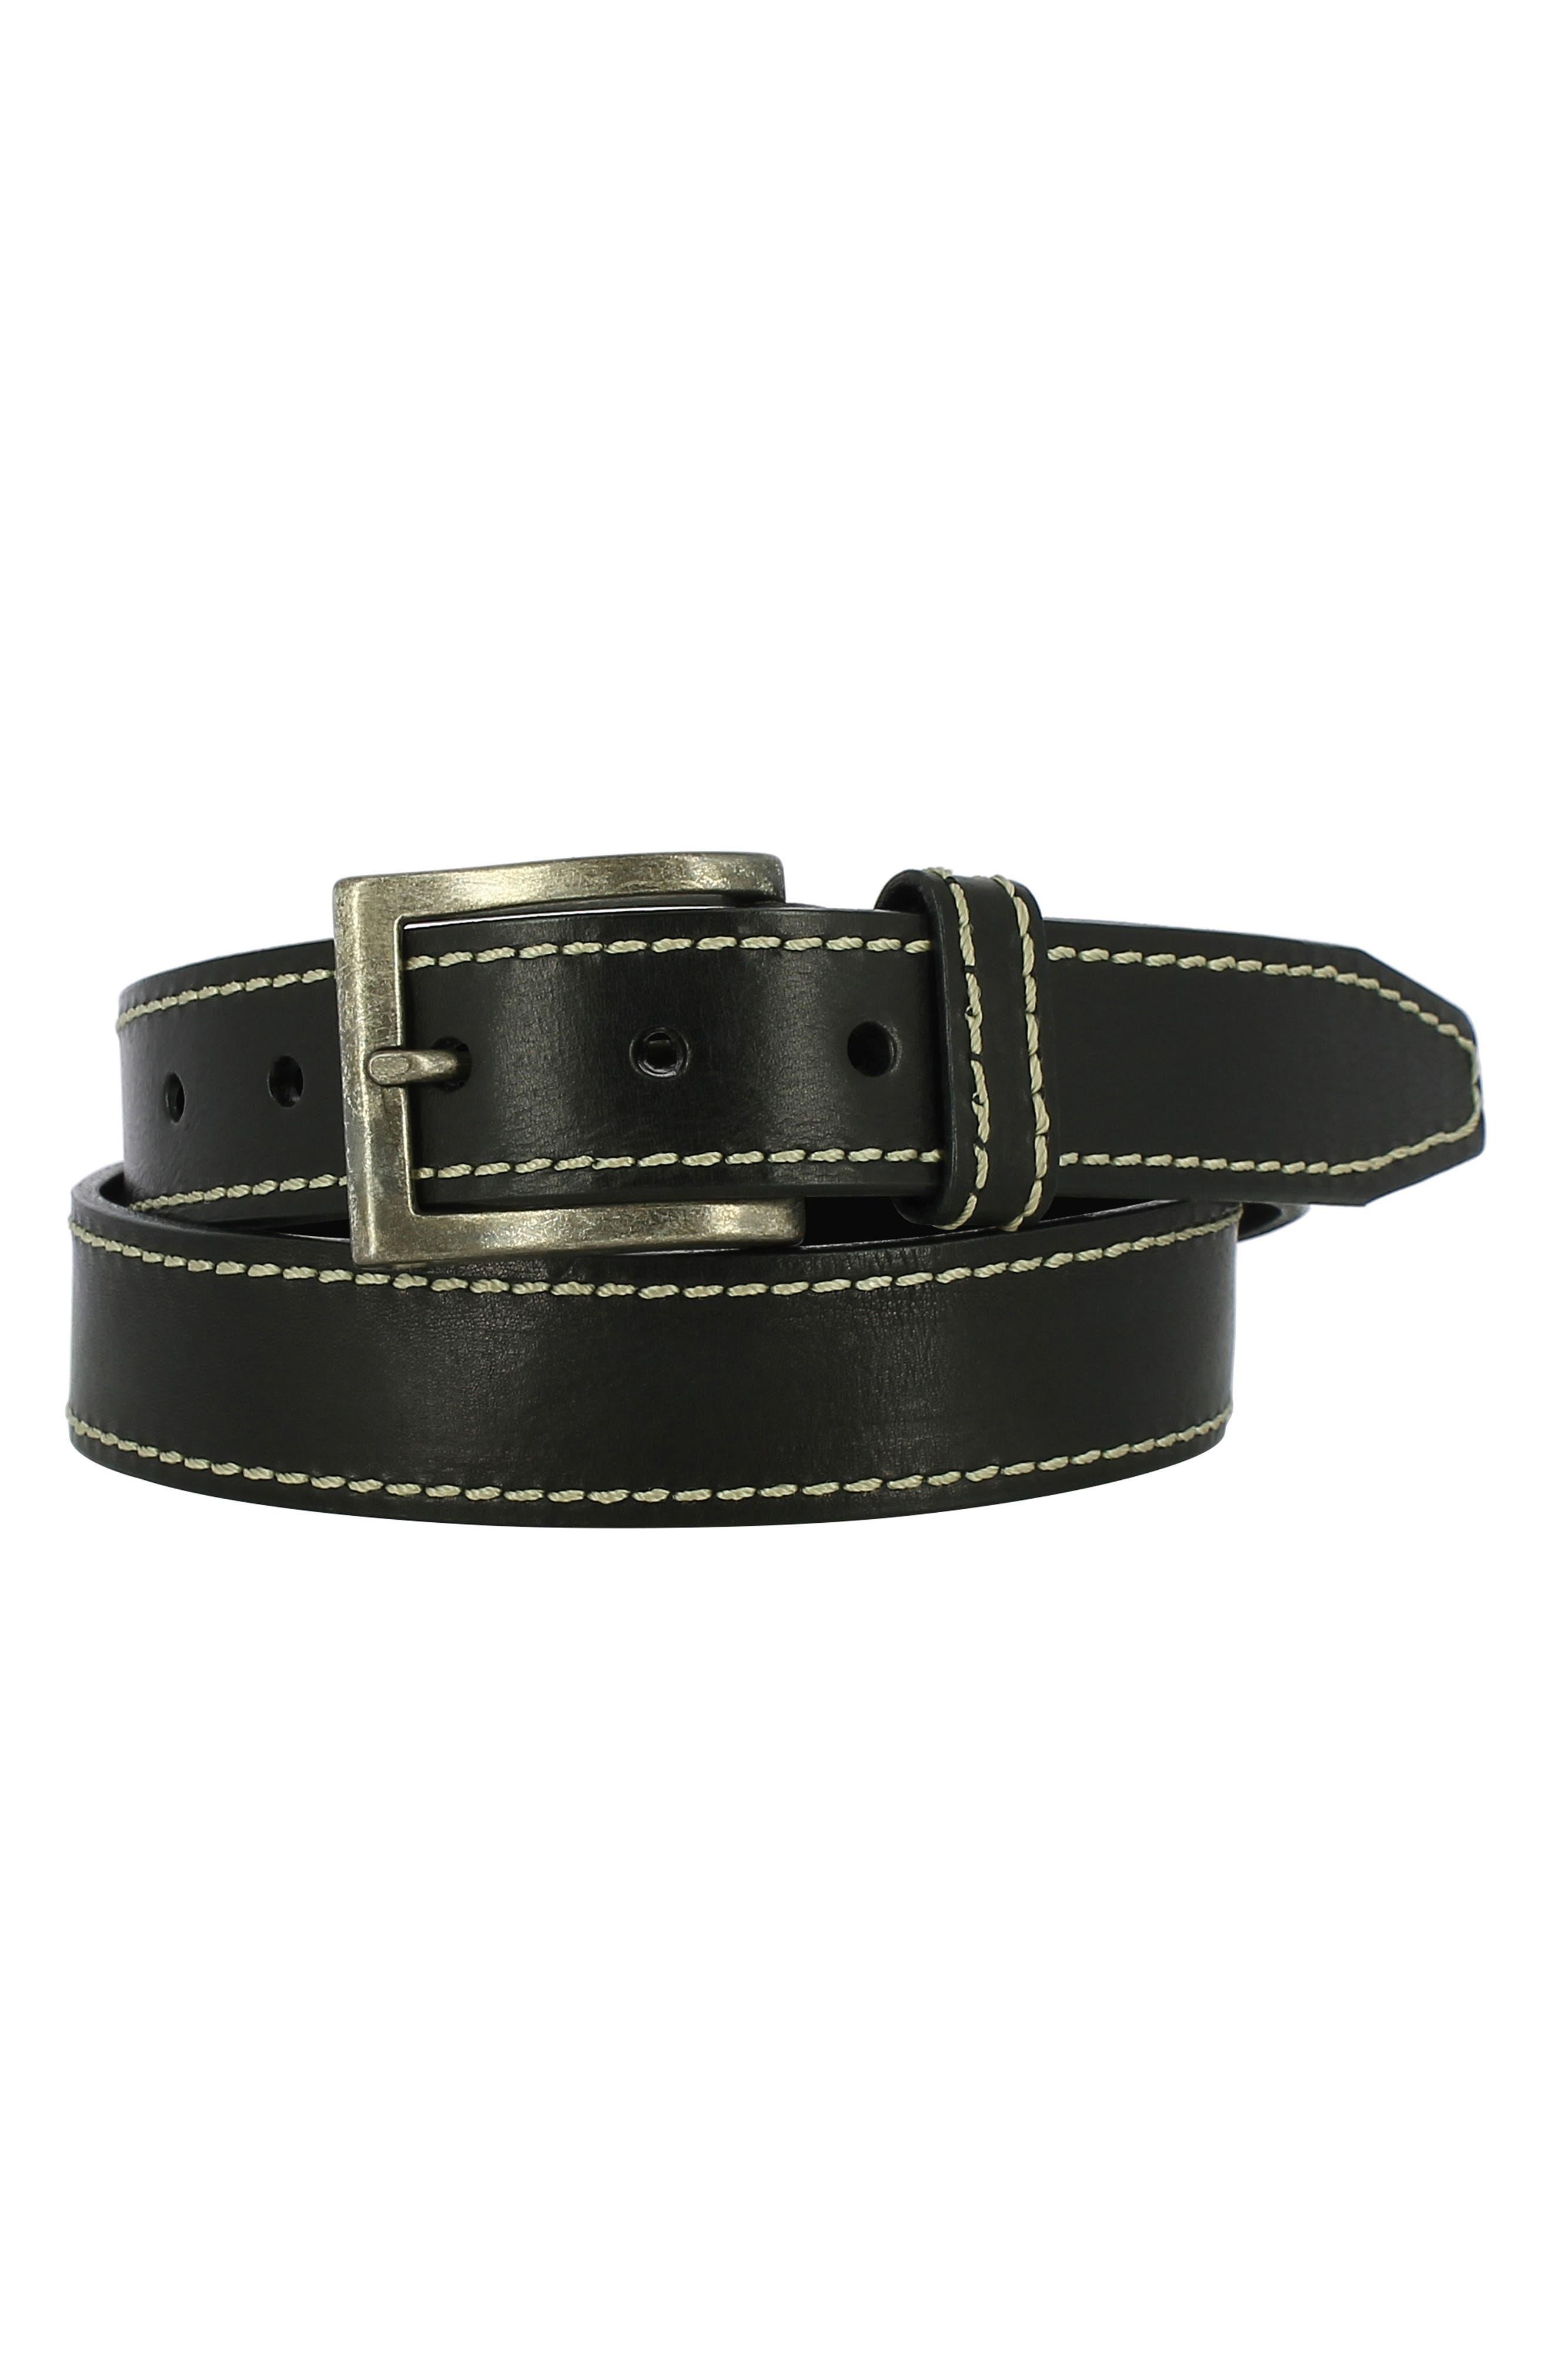 Bo Leather Belt,                             Main thumbnail 1, color,                             001